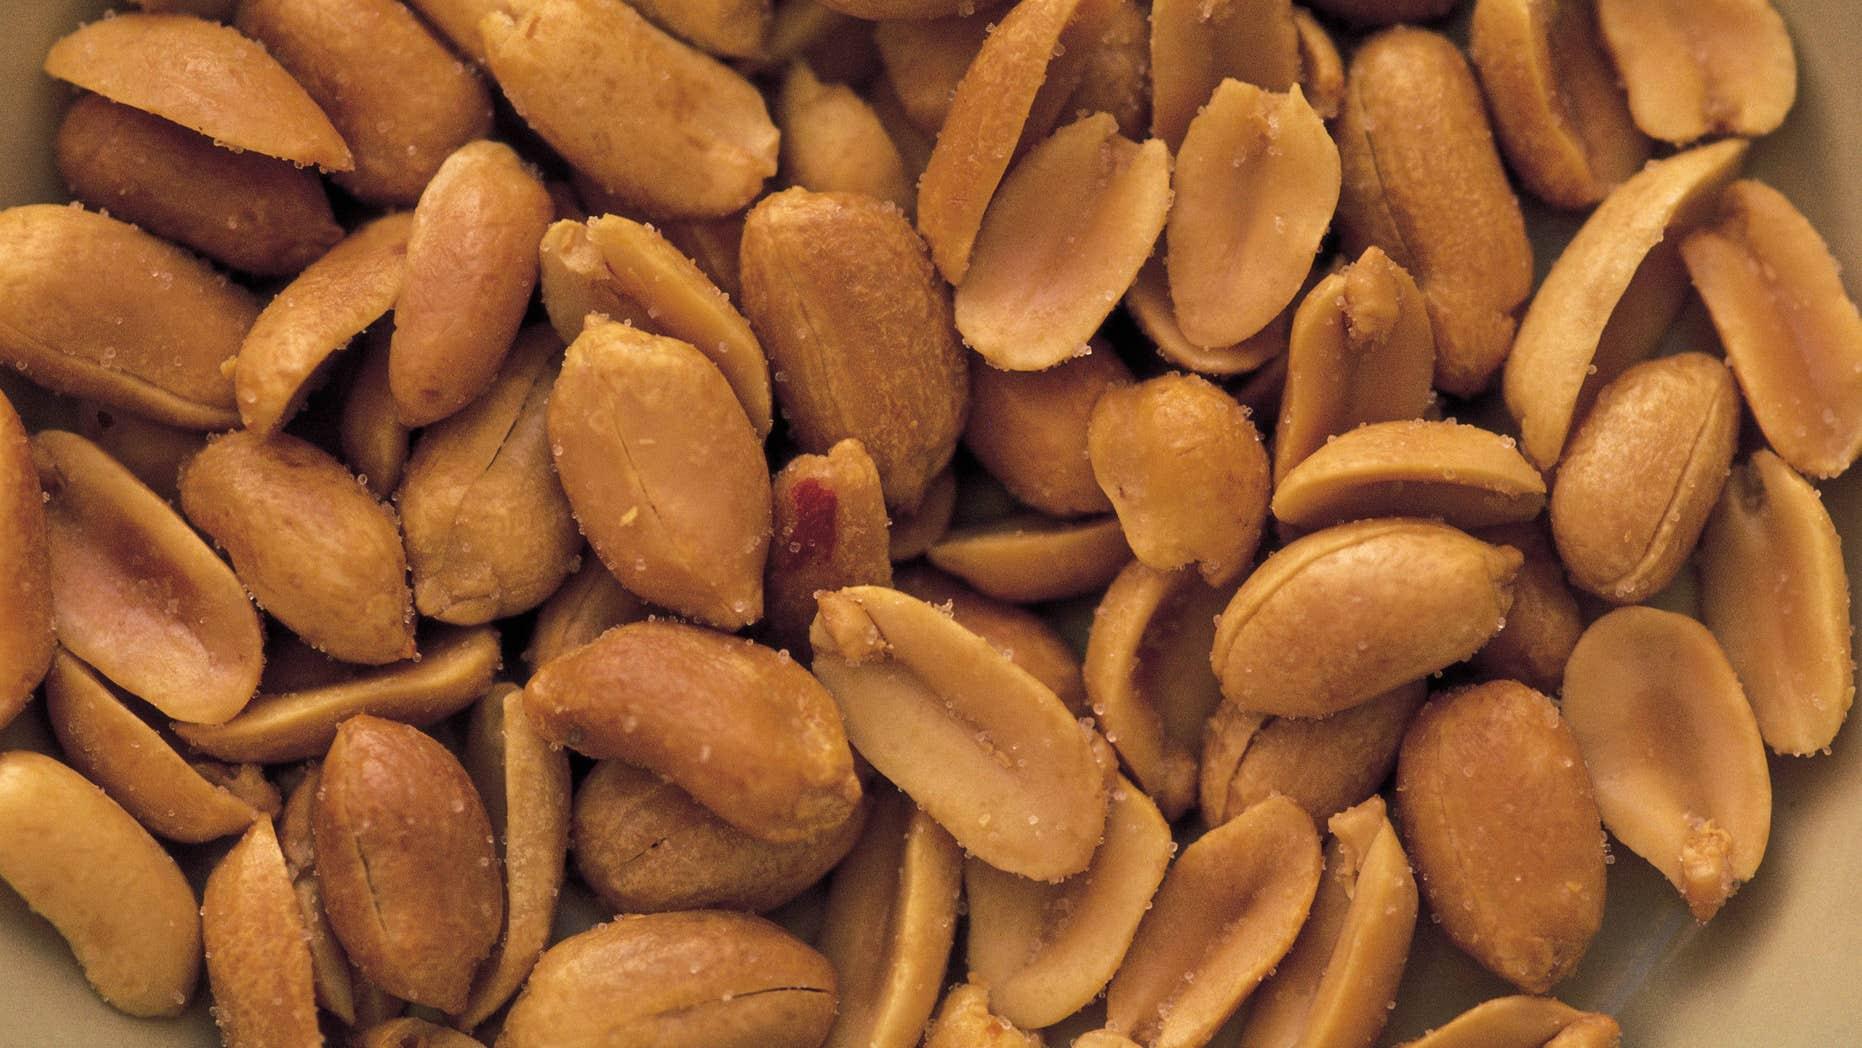 Peanuts  (Photo by Rafa Samano/Cover/Getty Images)